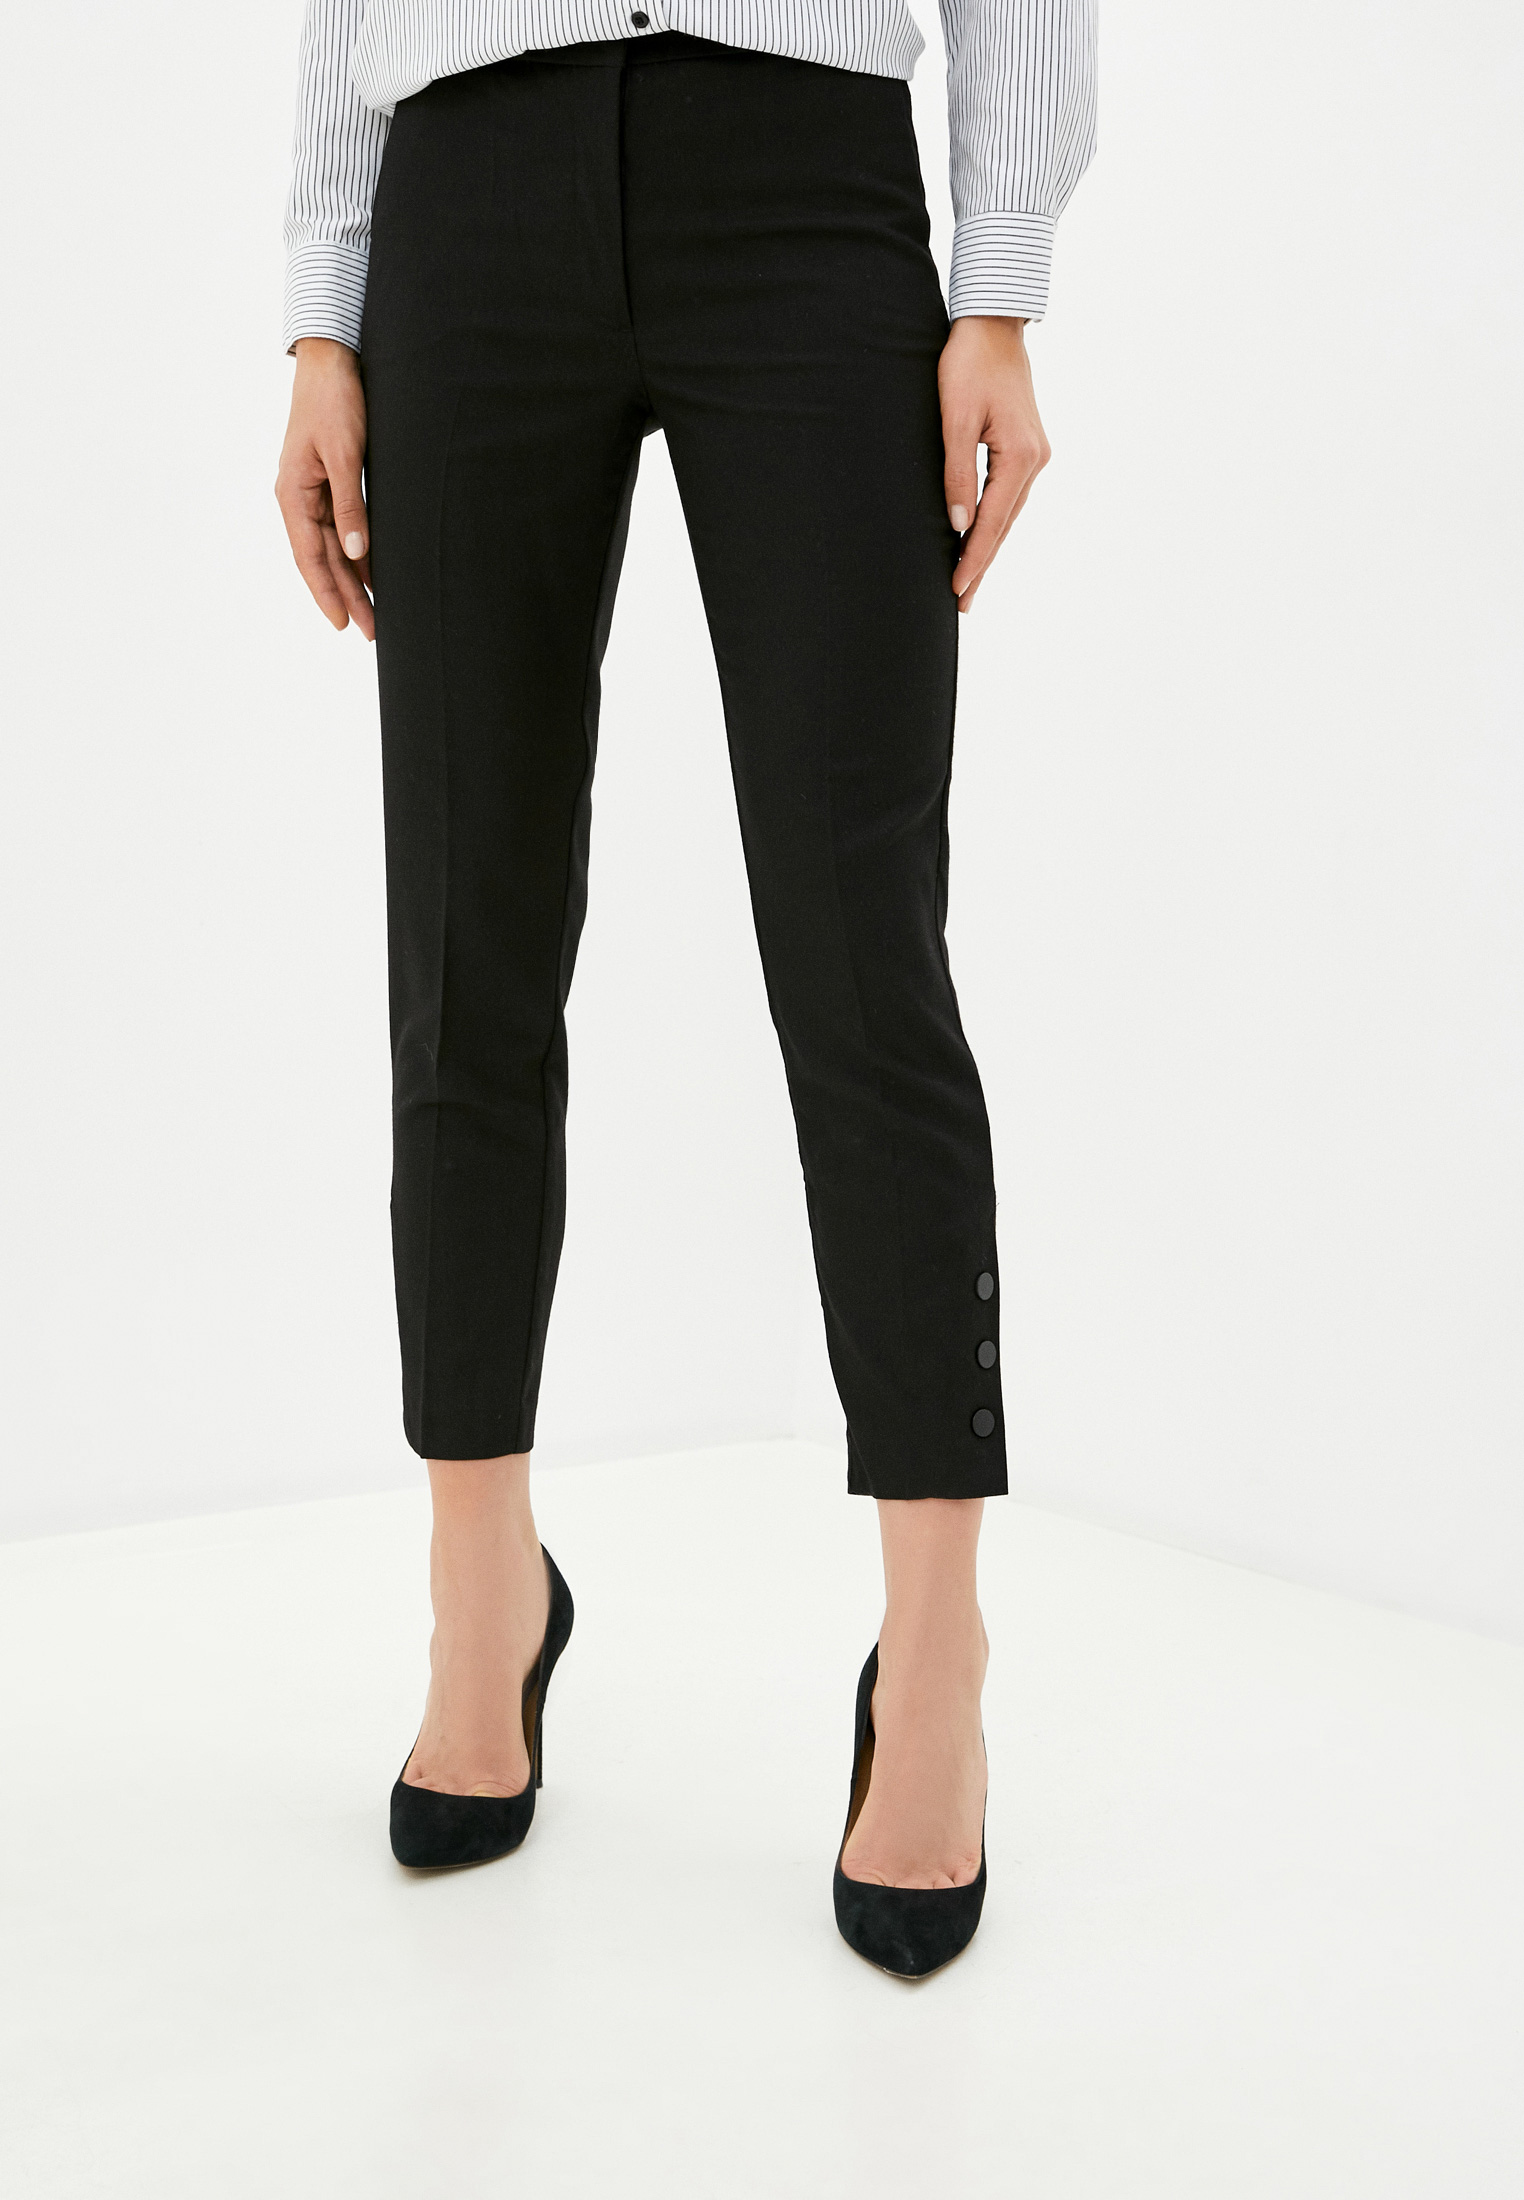 Женские классические брюки Zolla 20337366303